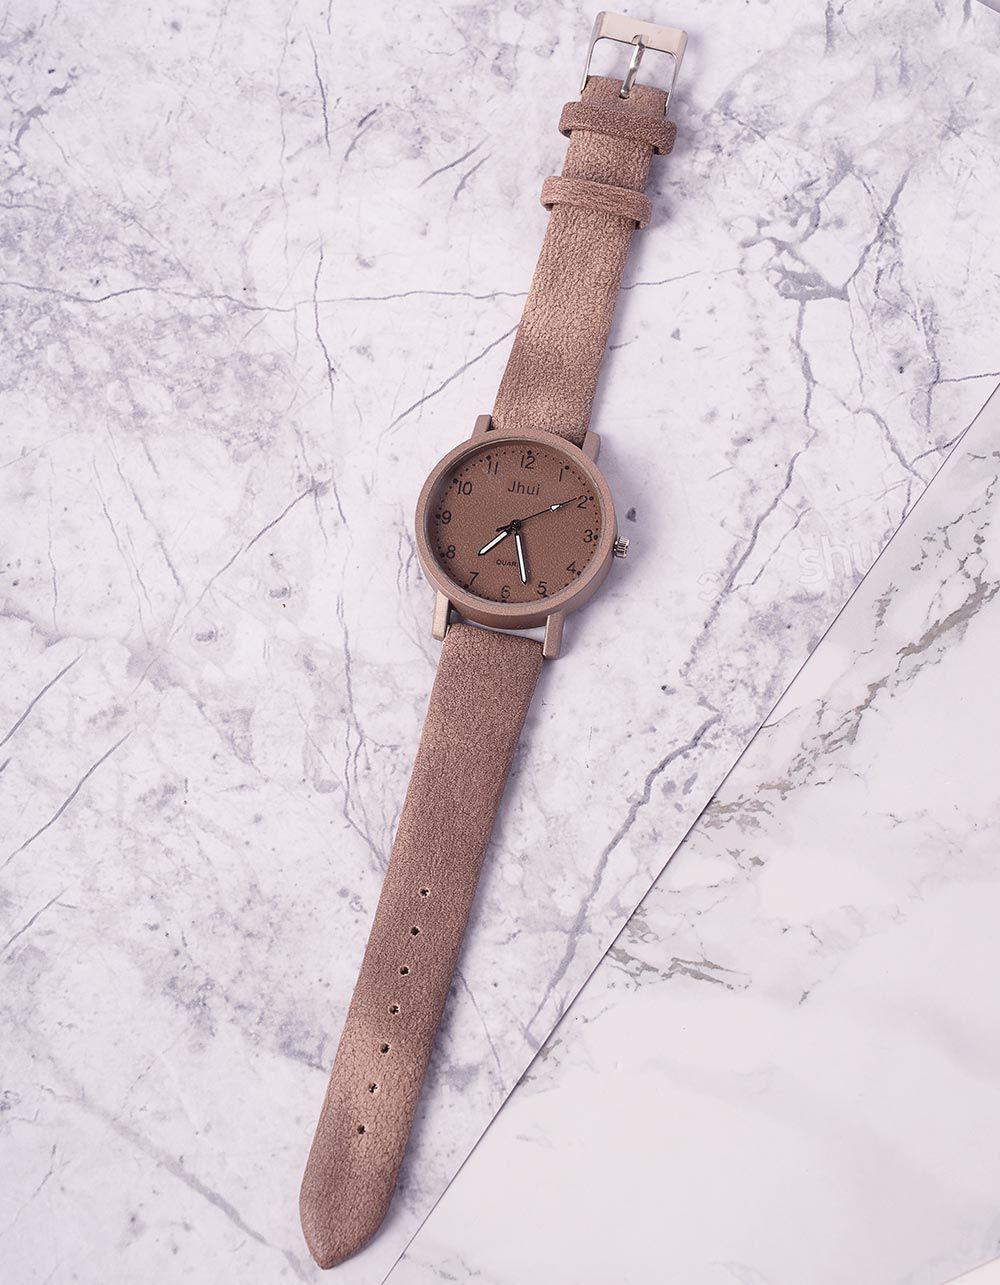 Годинник на руку з круглим циферблатом | 237305-39-XX